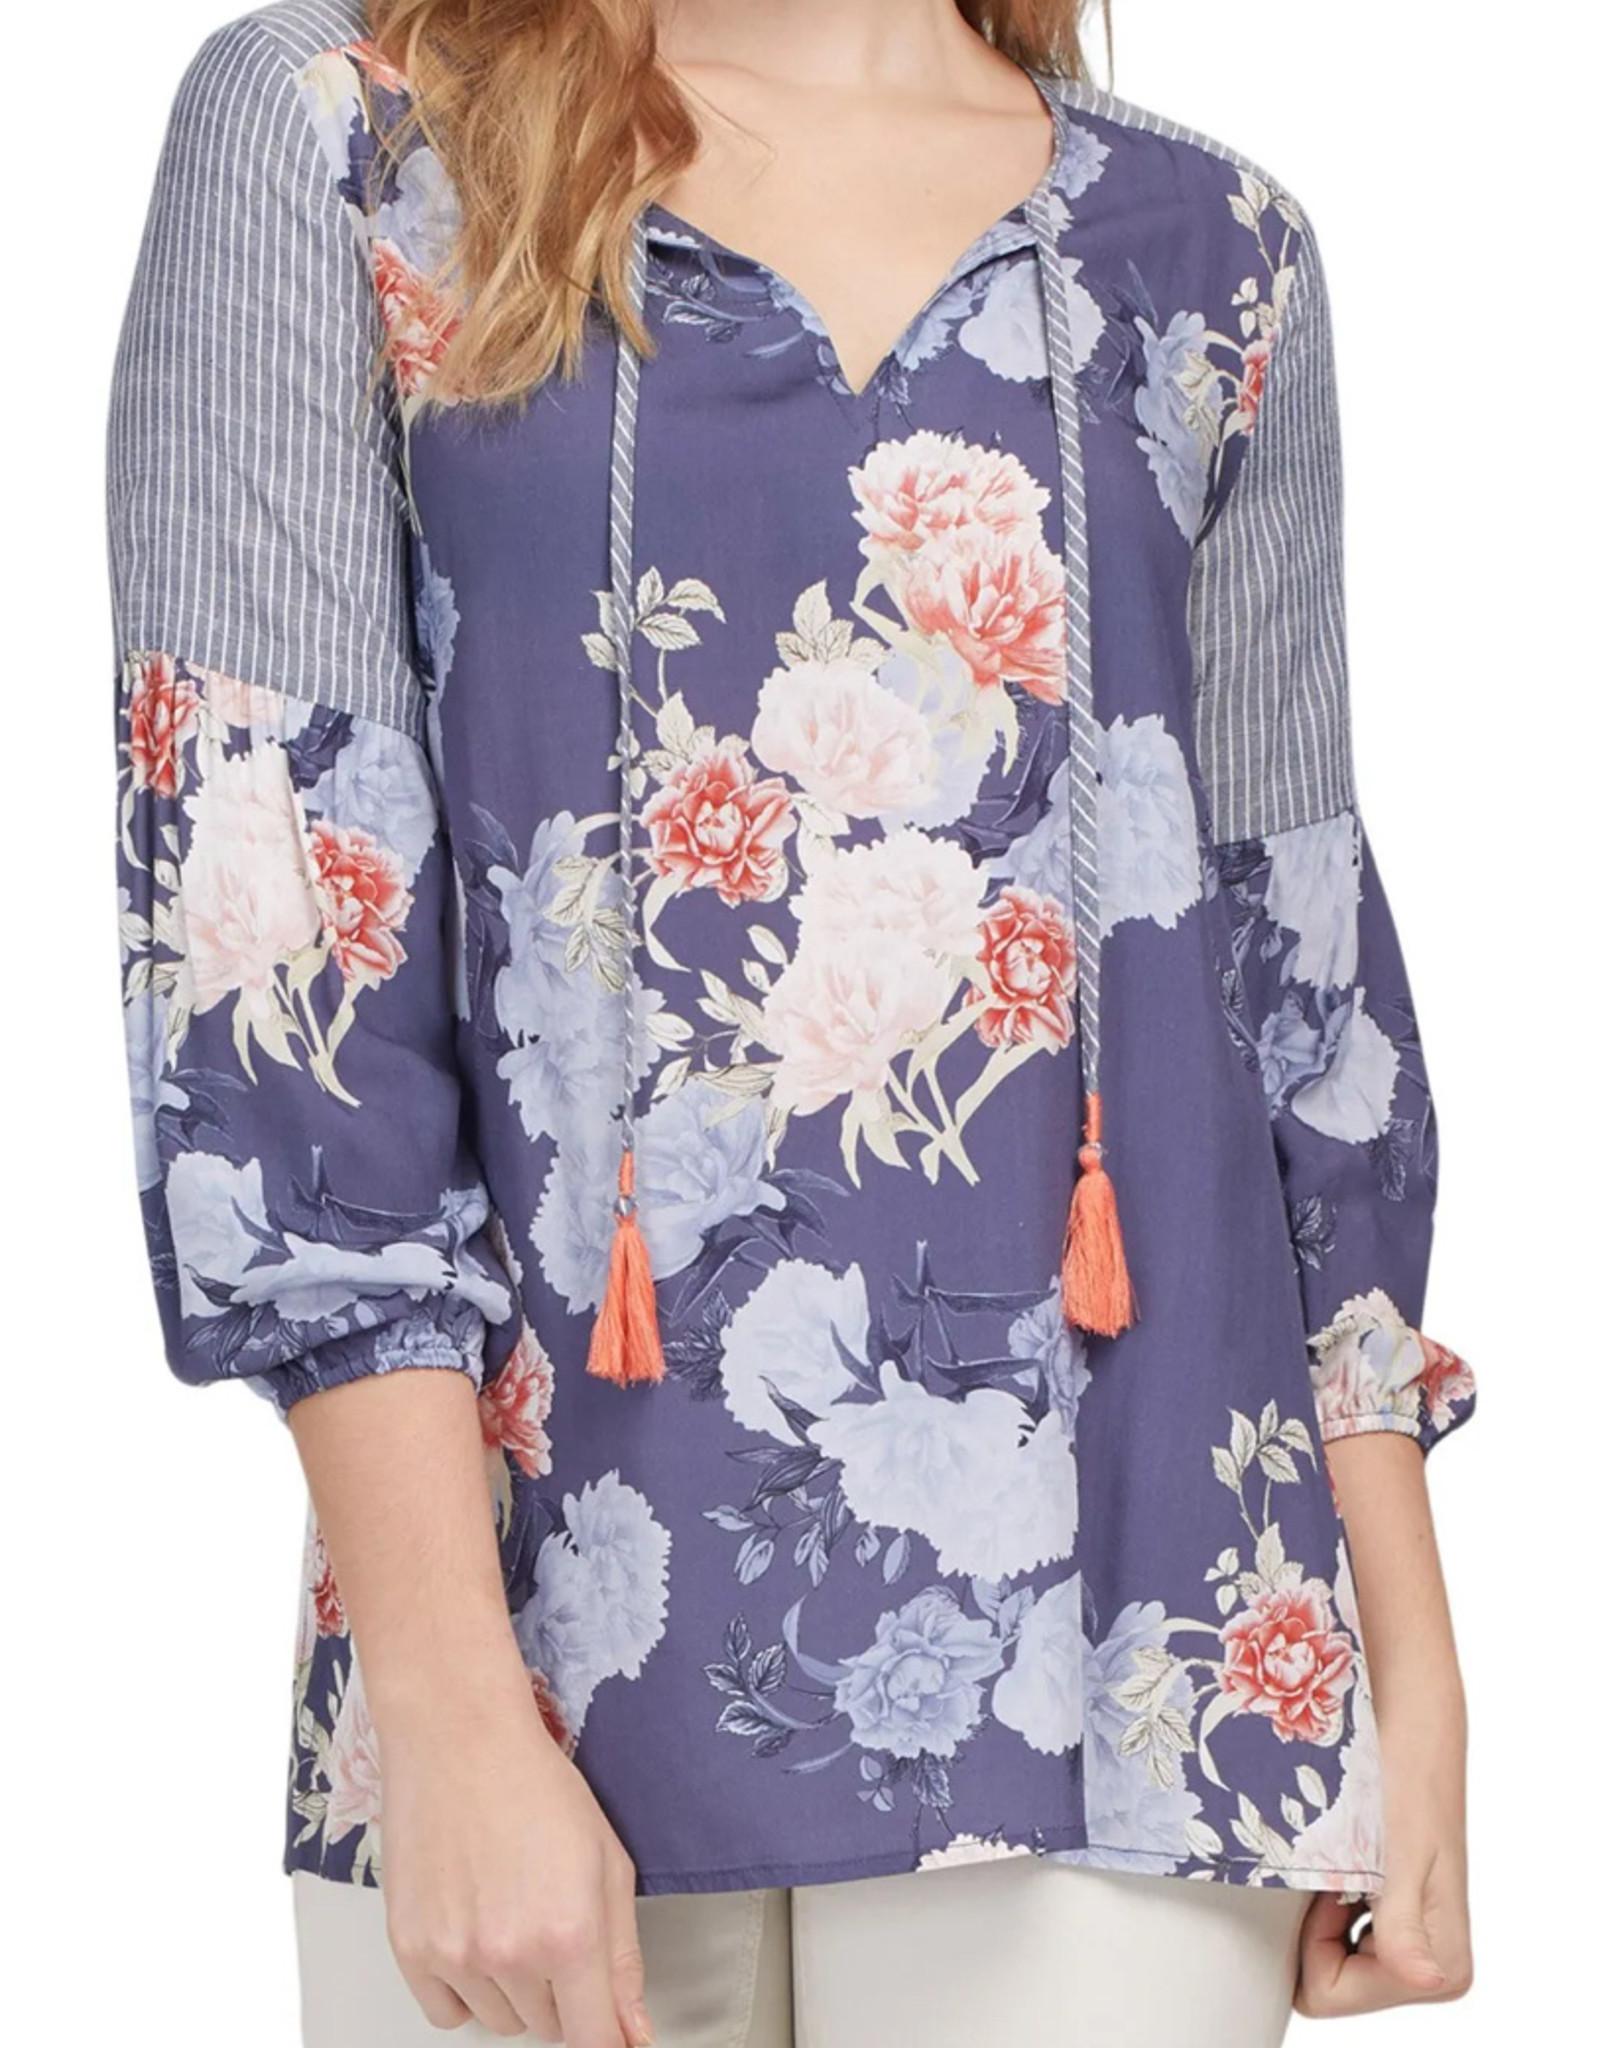 Tribal Tribal 3/4 sleeve blouse 7097O